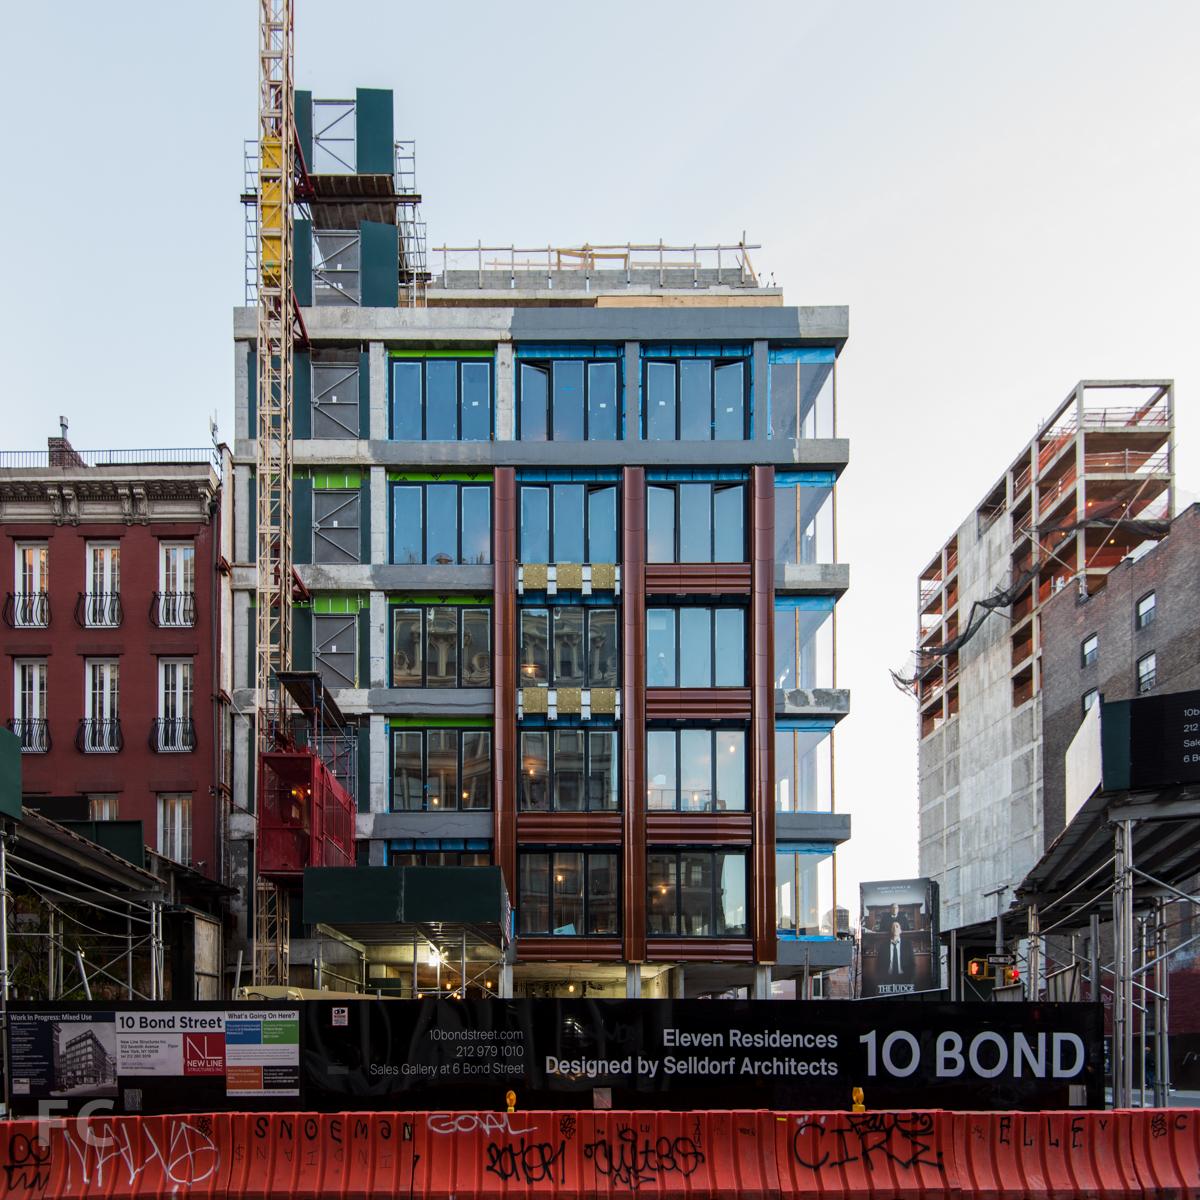 South façade from Bond Street.